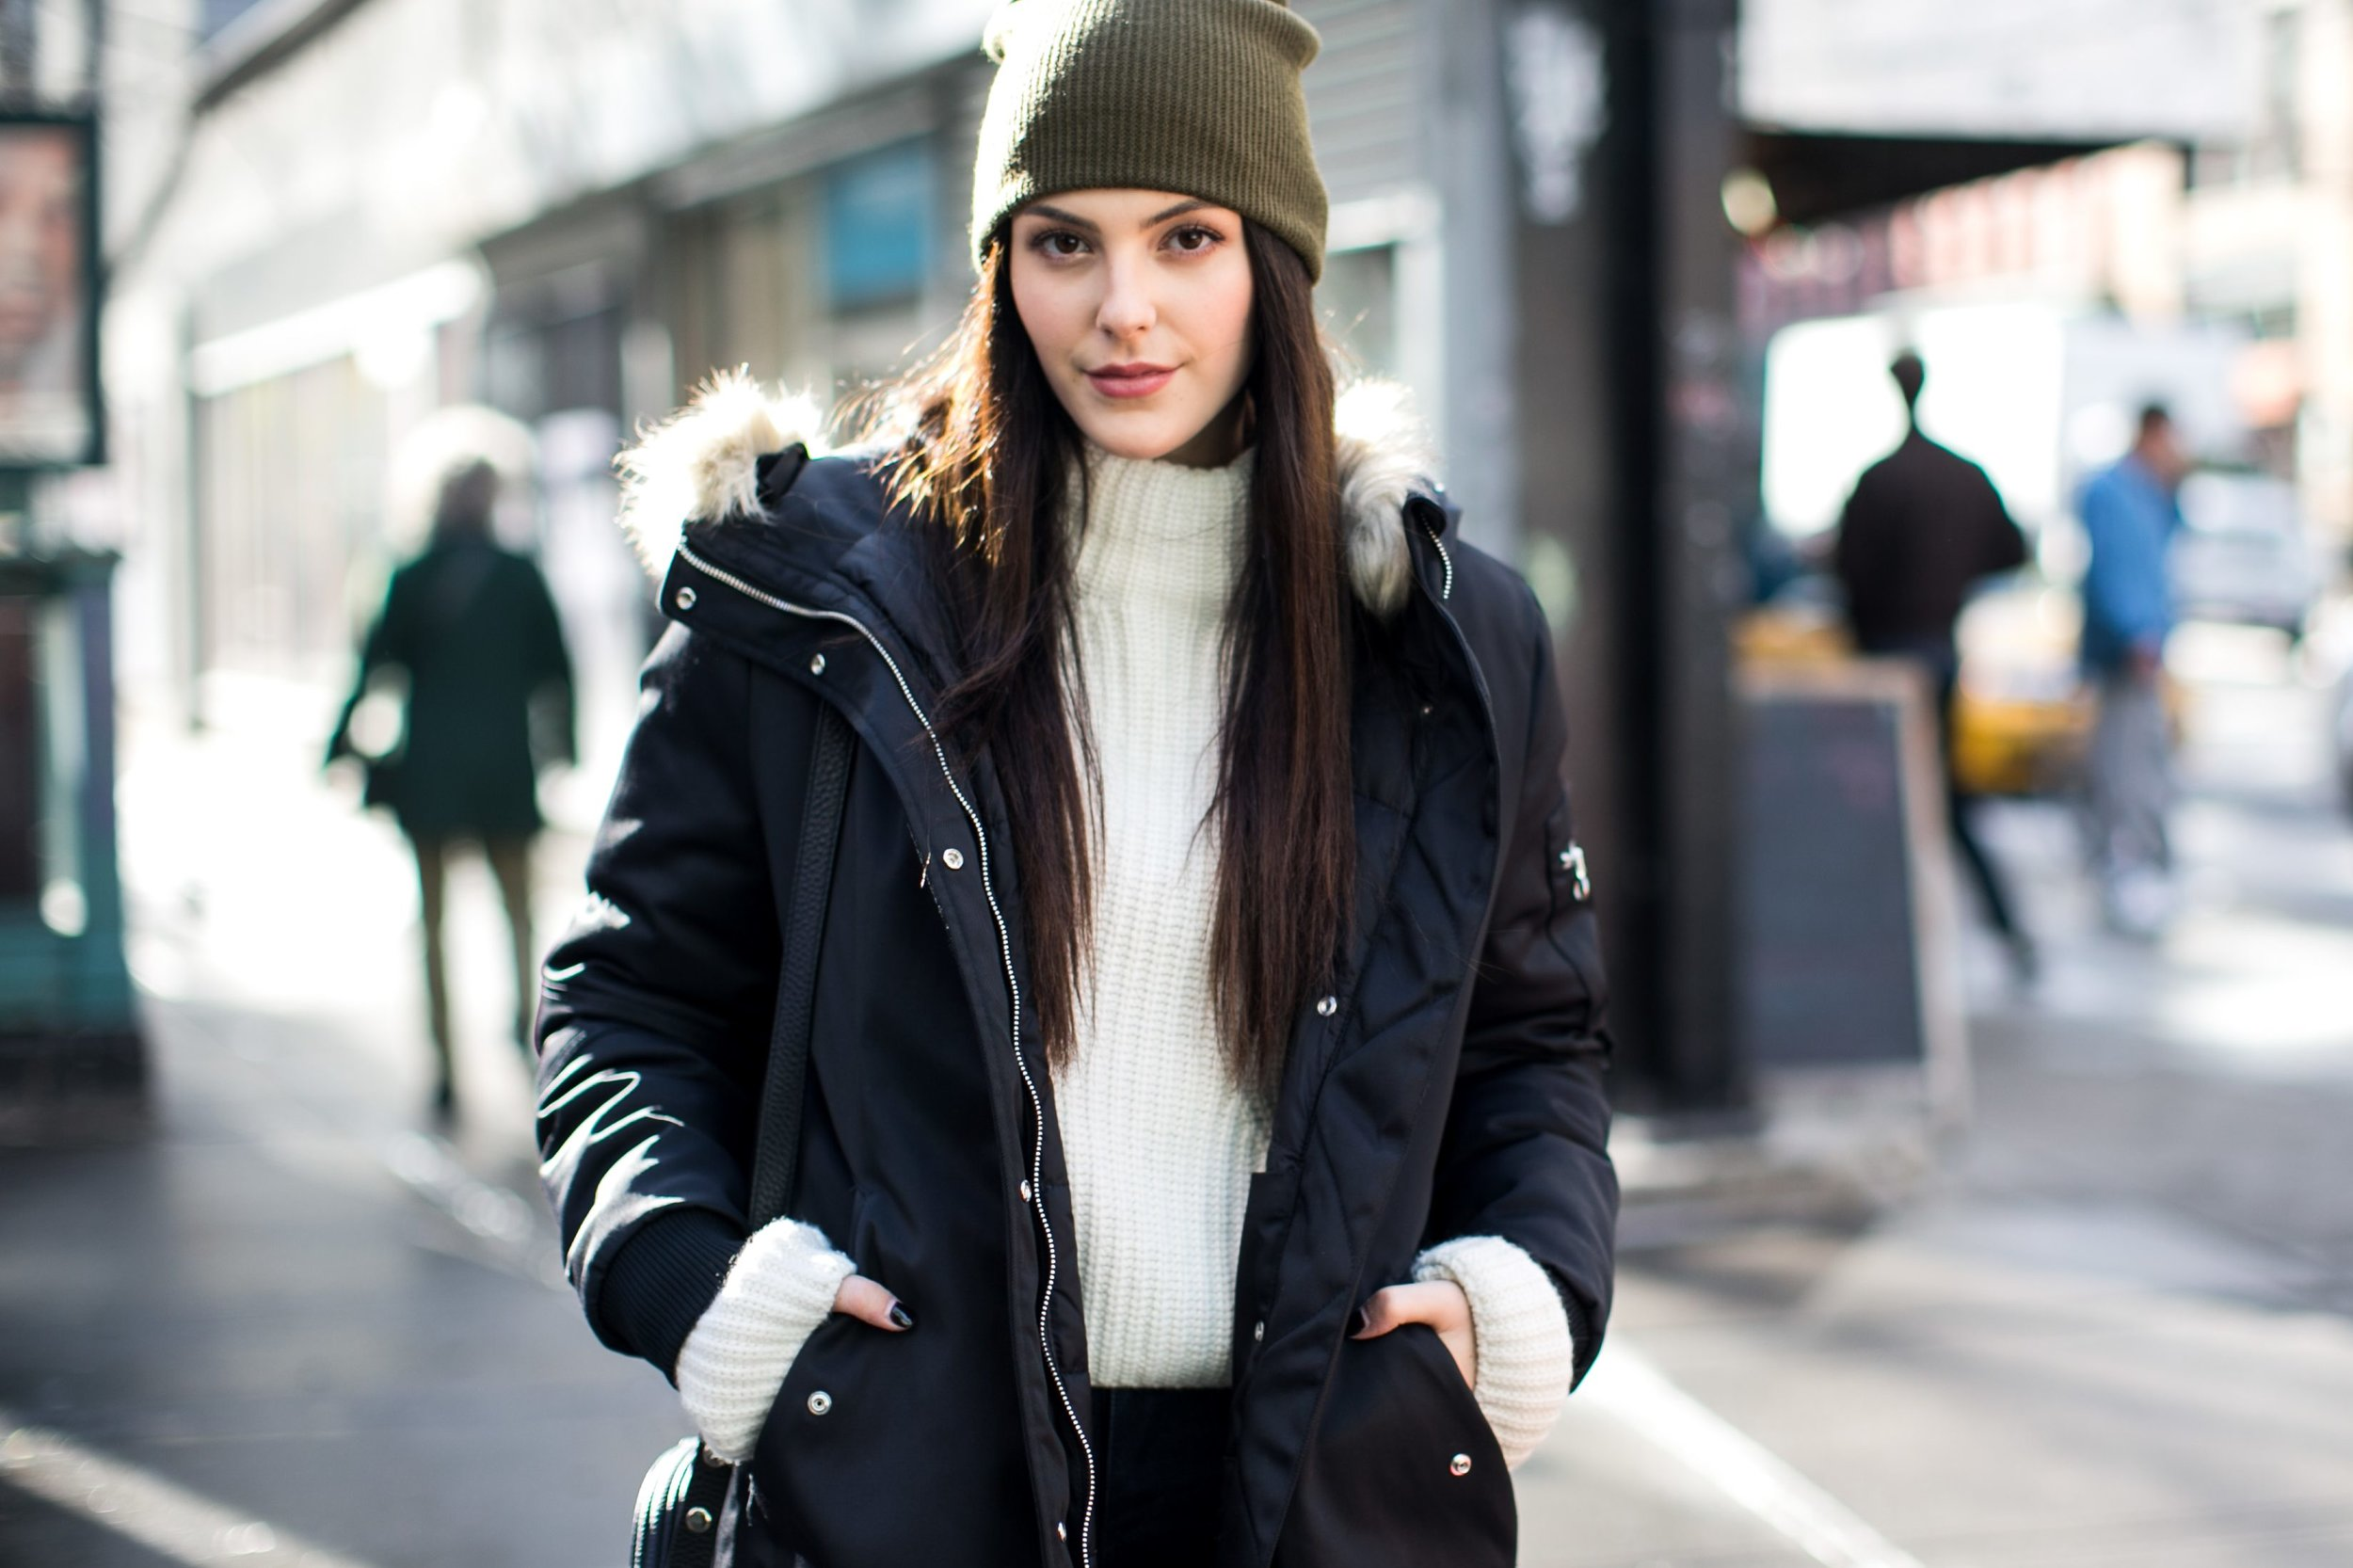 Julia Friedman New York Trip in December